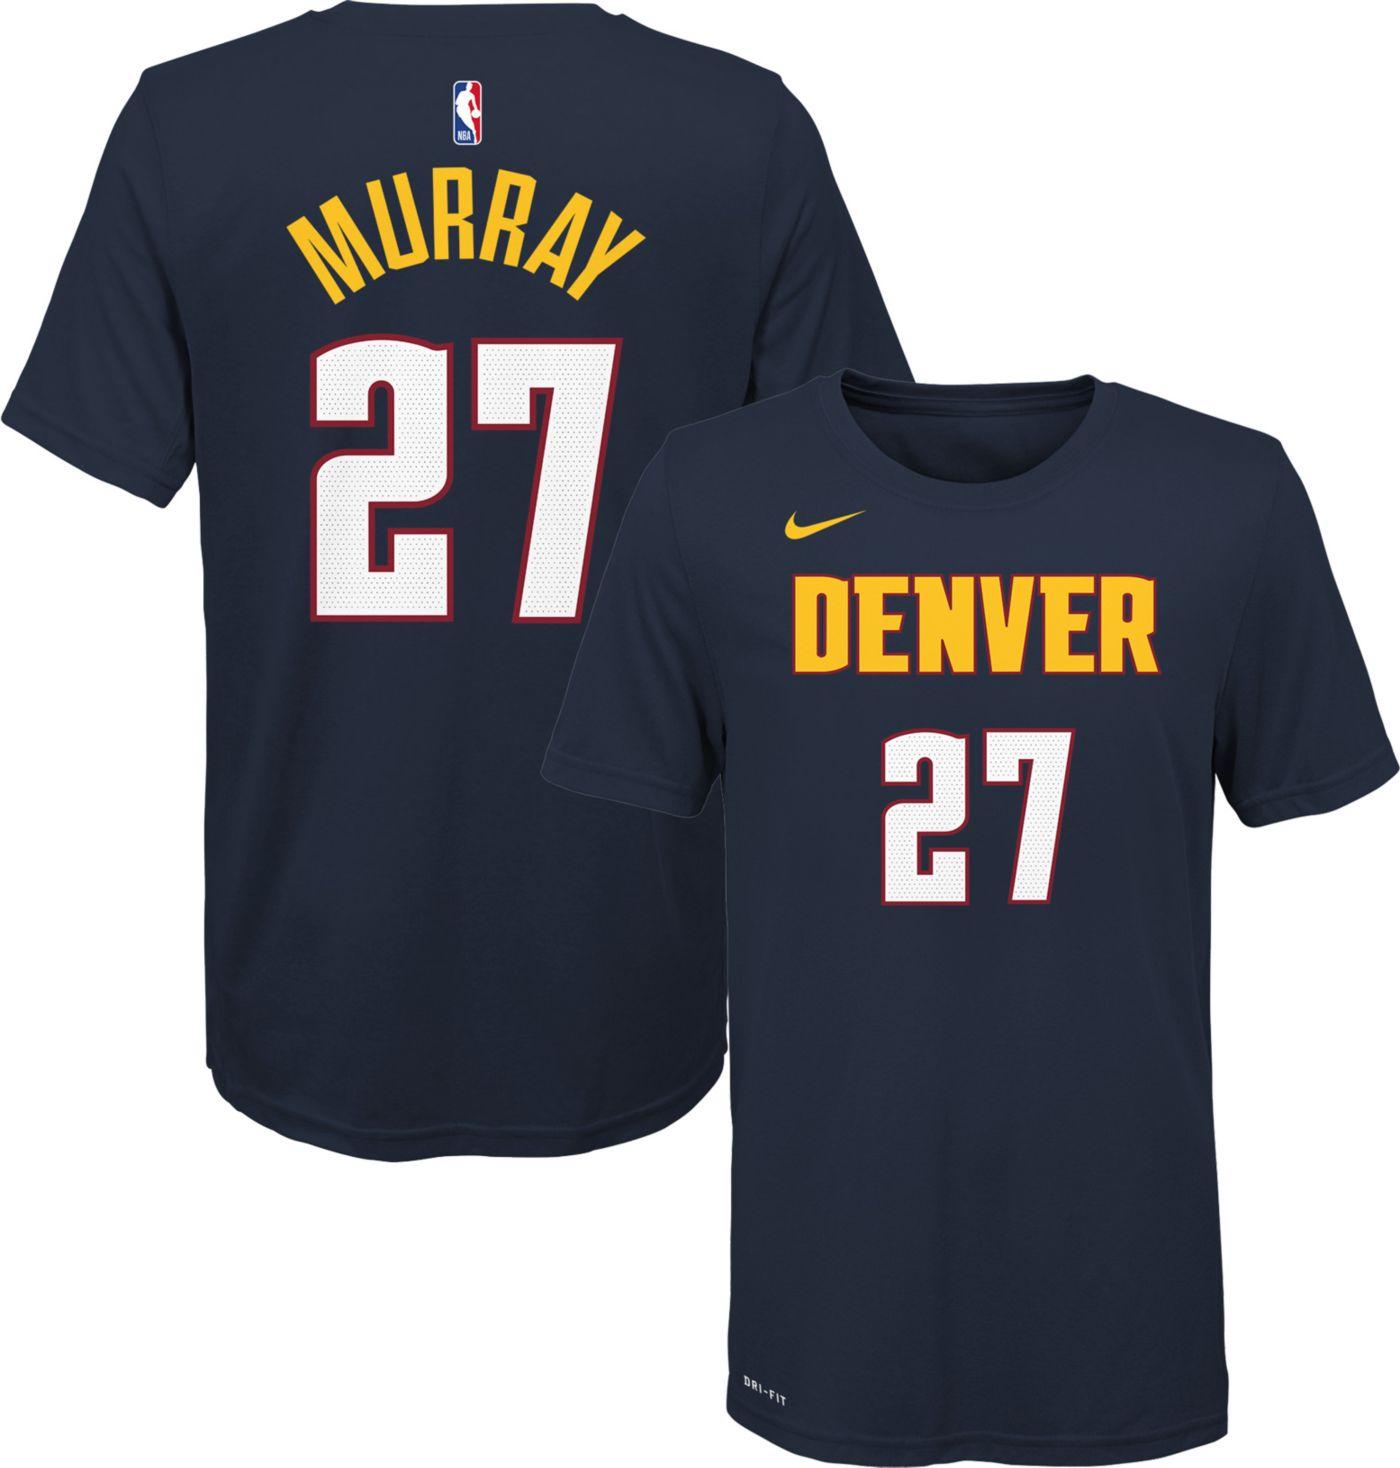 Nike Youth Denver Nuggets Jamal Murray #27 Dri-FIT Navy T-Shirt